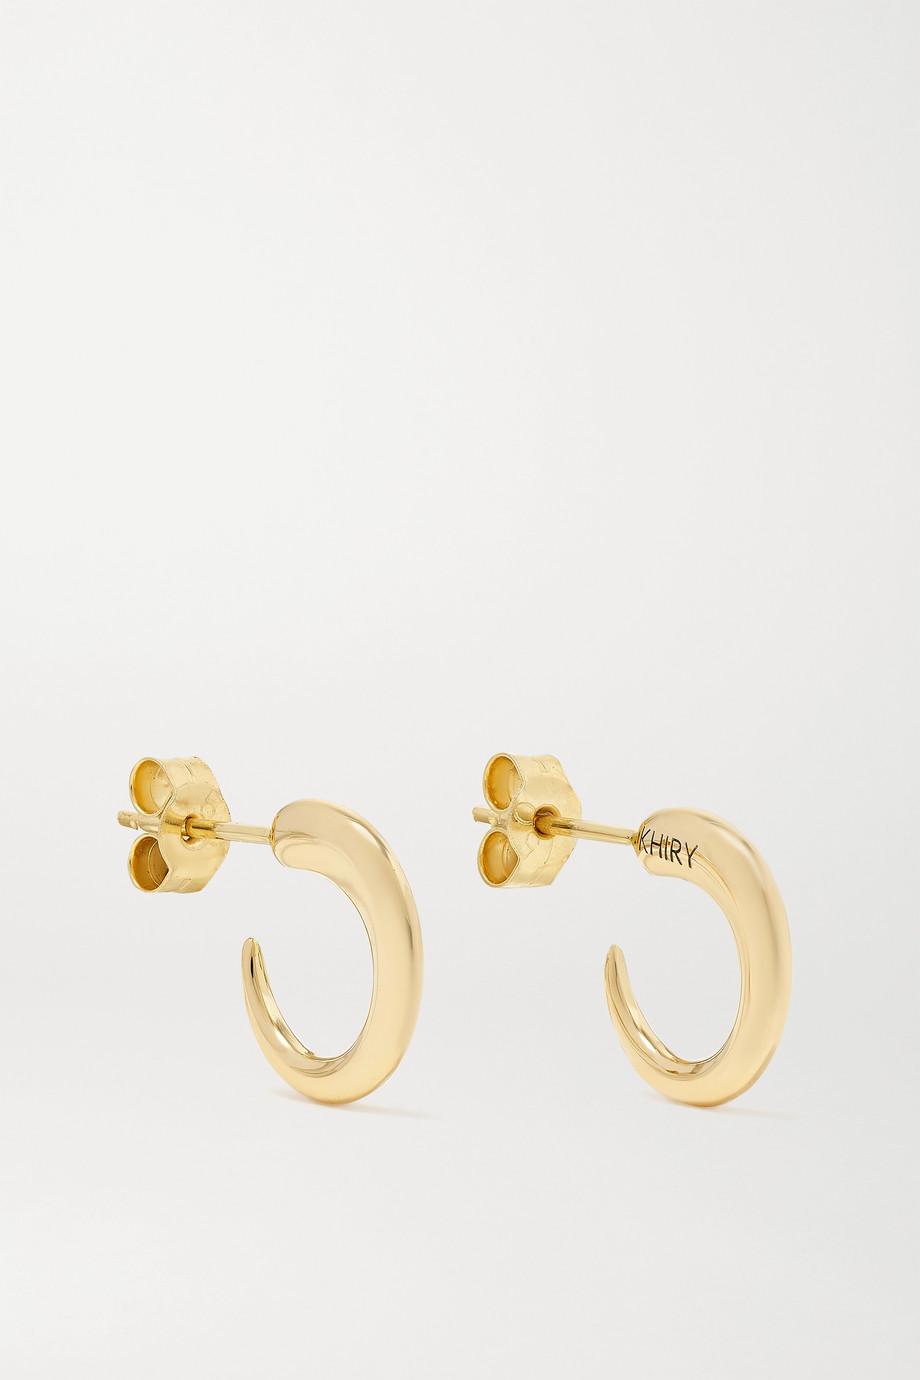 KHIRY Fine Boucles d'oreilles en or 18 carats Khartoum Tiny